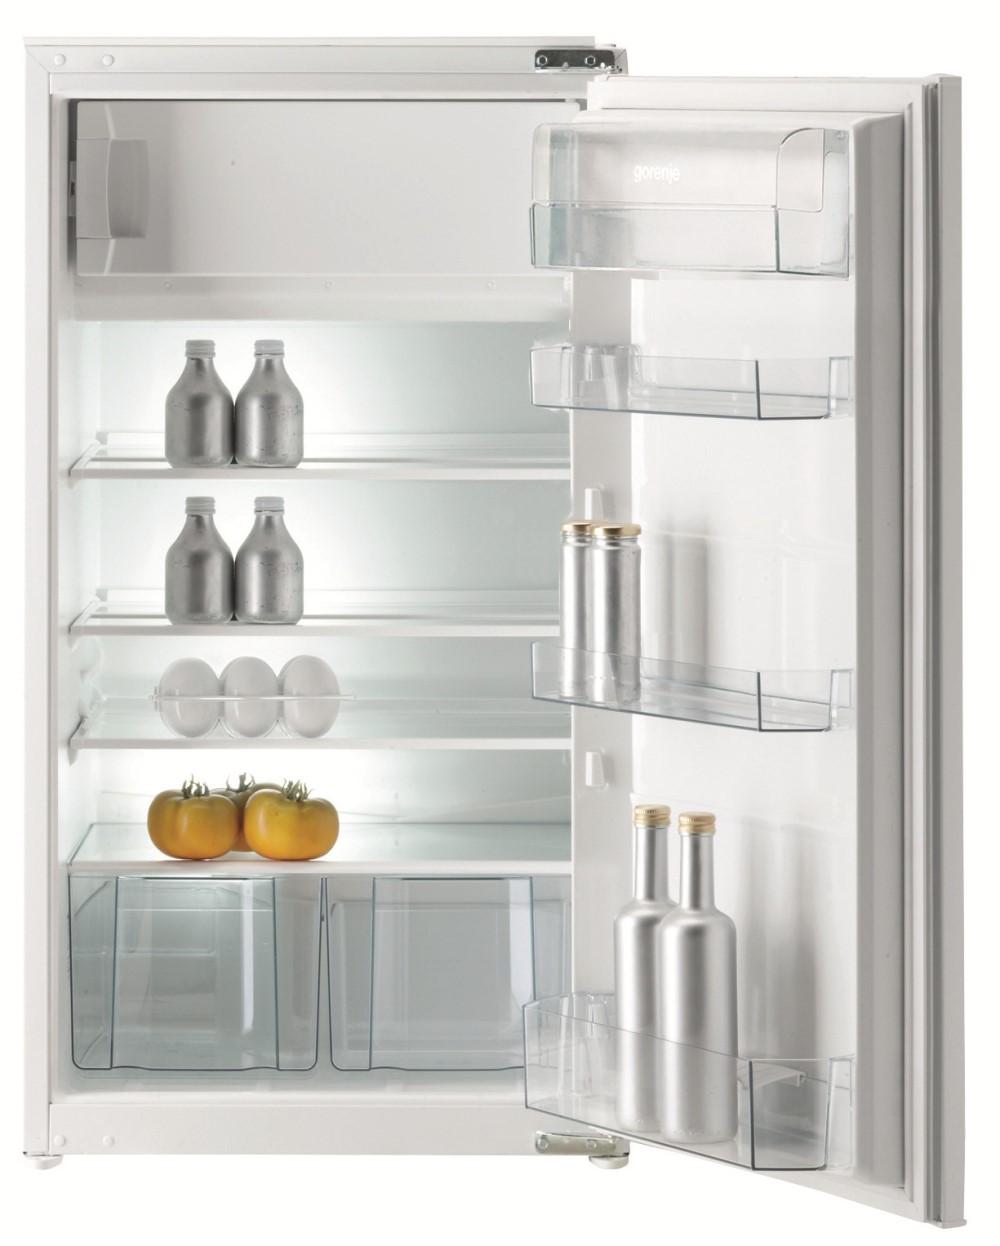 Gorenje RBI4102AW Einbau-Kühlschrank/ Energieeffizienzklasse A++